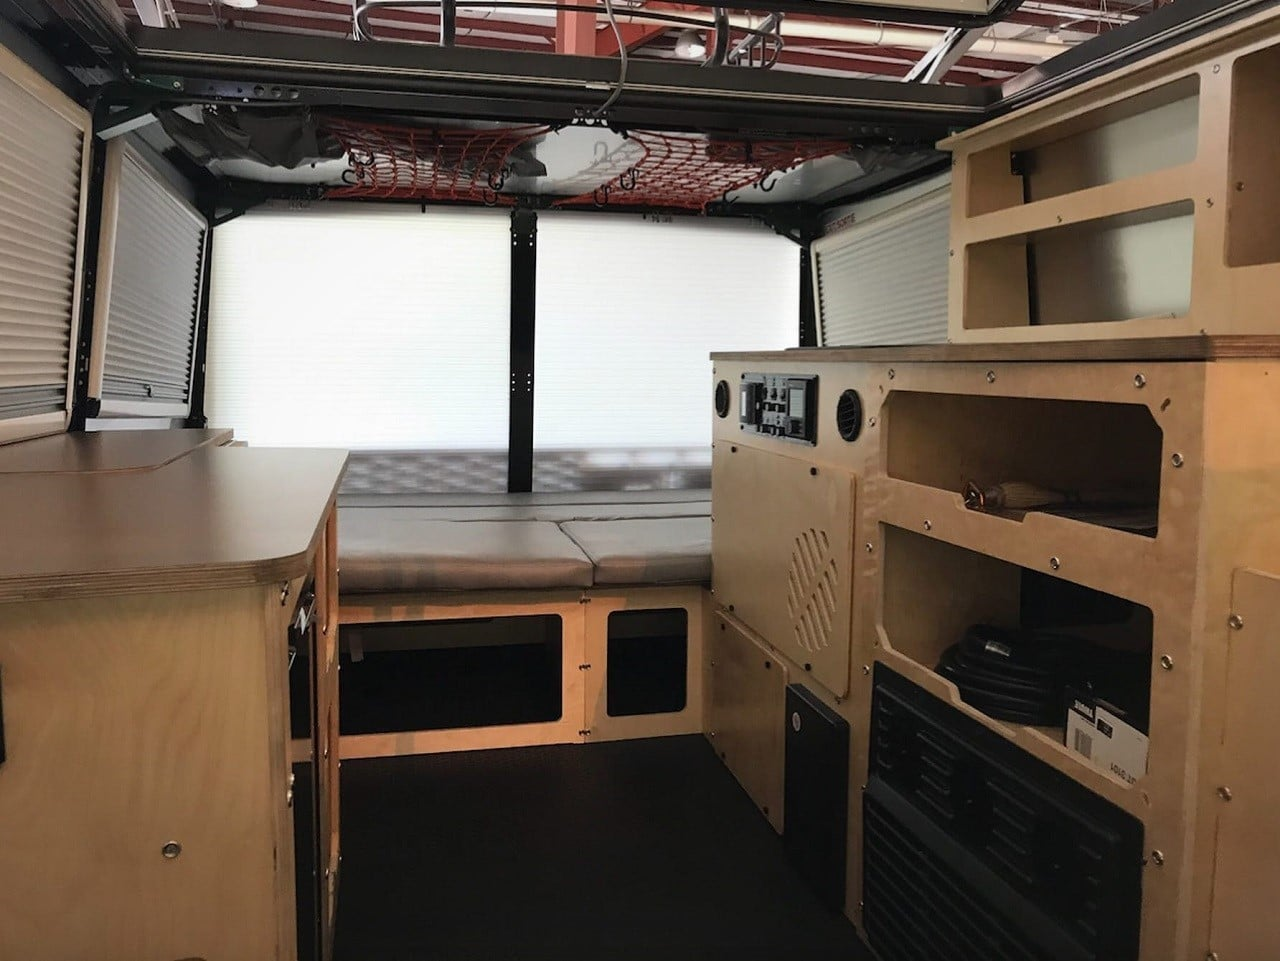 rear kitchen travel trailer quality brand cabinets taxa mantis camper   men's gear